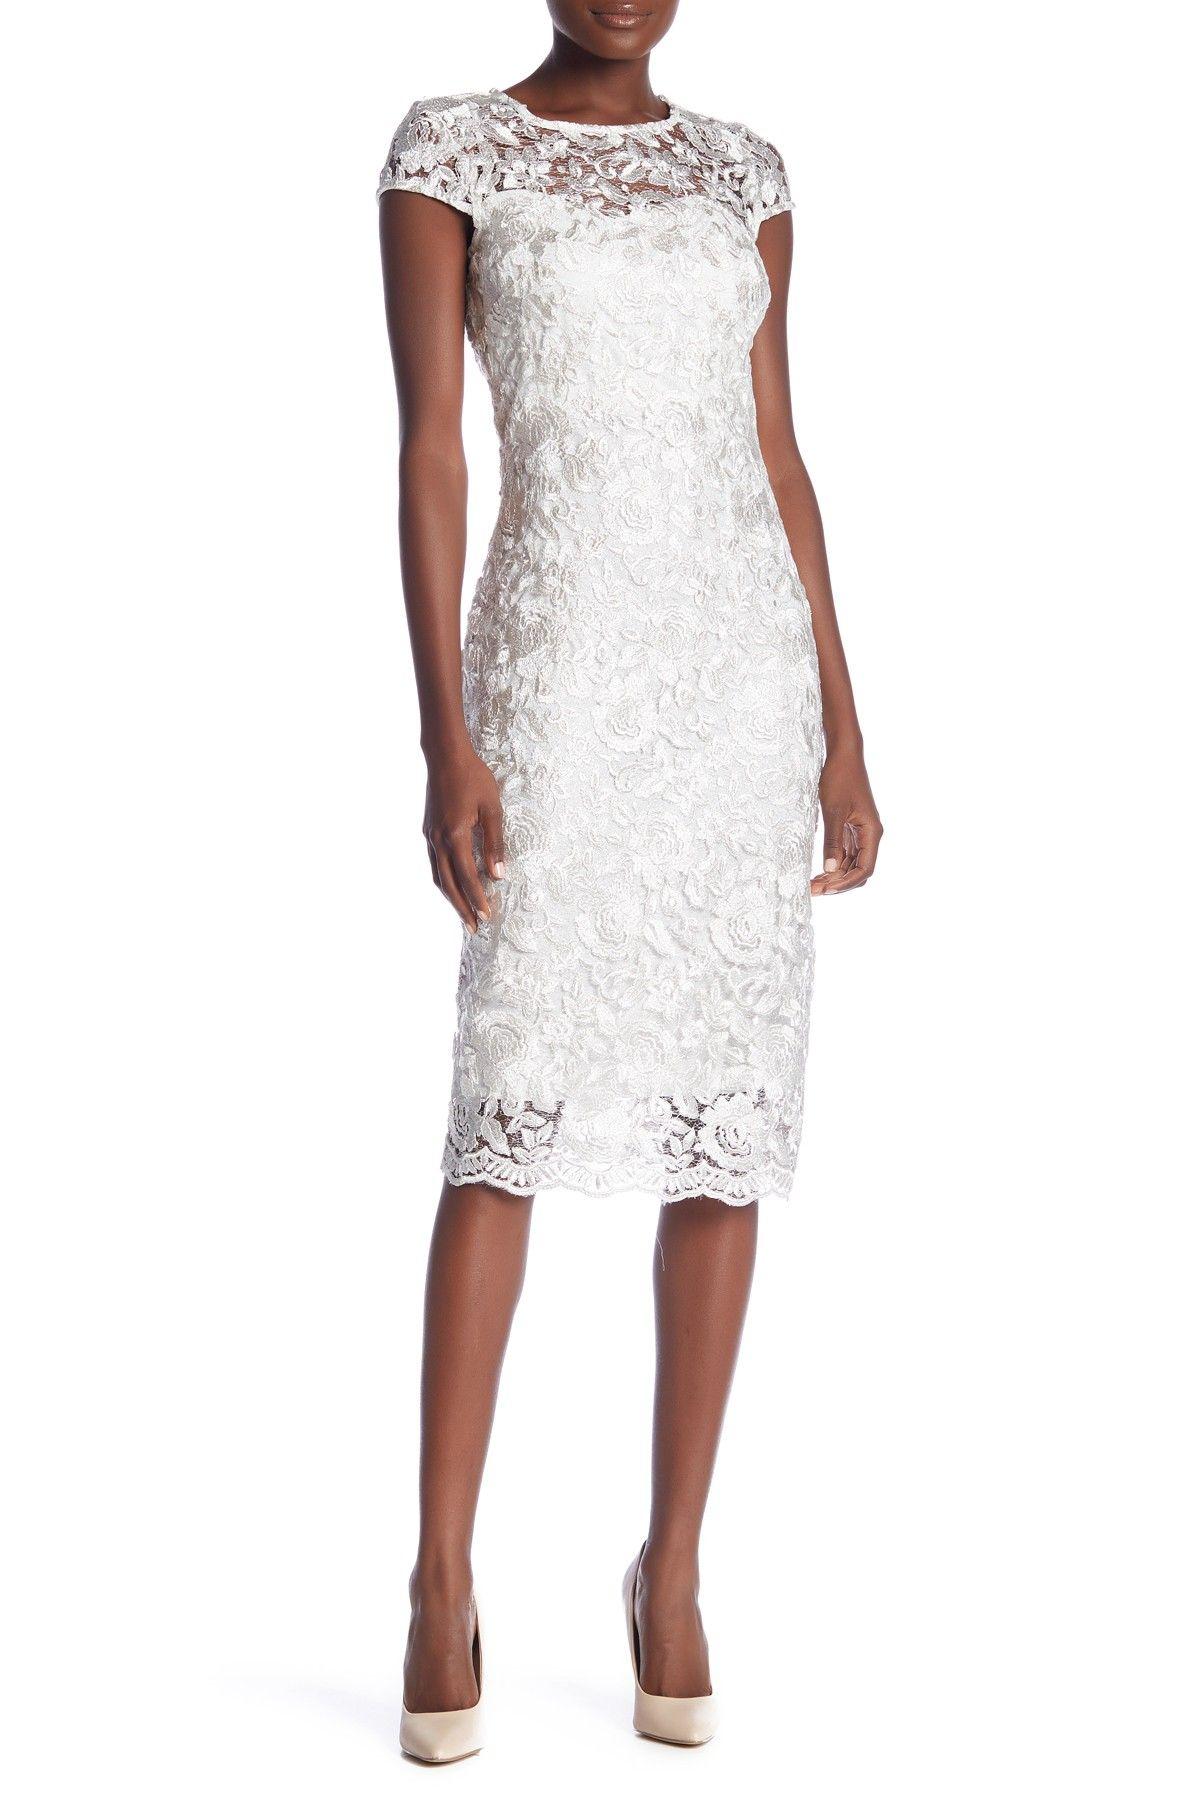 Marina Scalloped Lace Cap Sleeve Sheath Dress Nordstrom Rack Dresses Lace Overlay Dress Nordstrom Dresses [ 1800 x 1200 Pixel ]